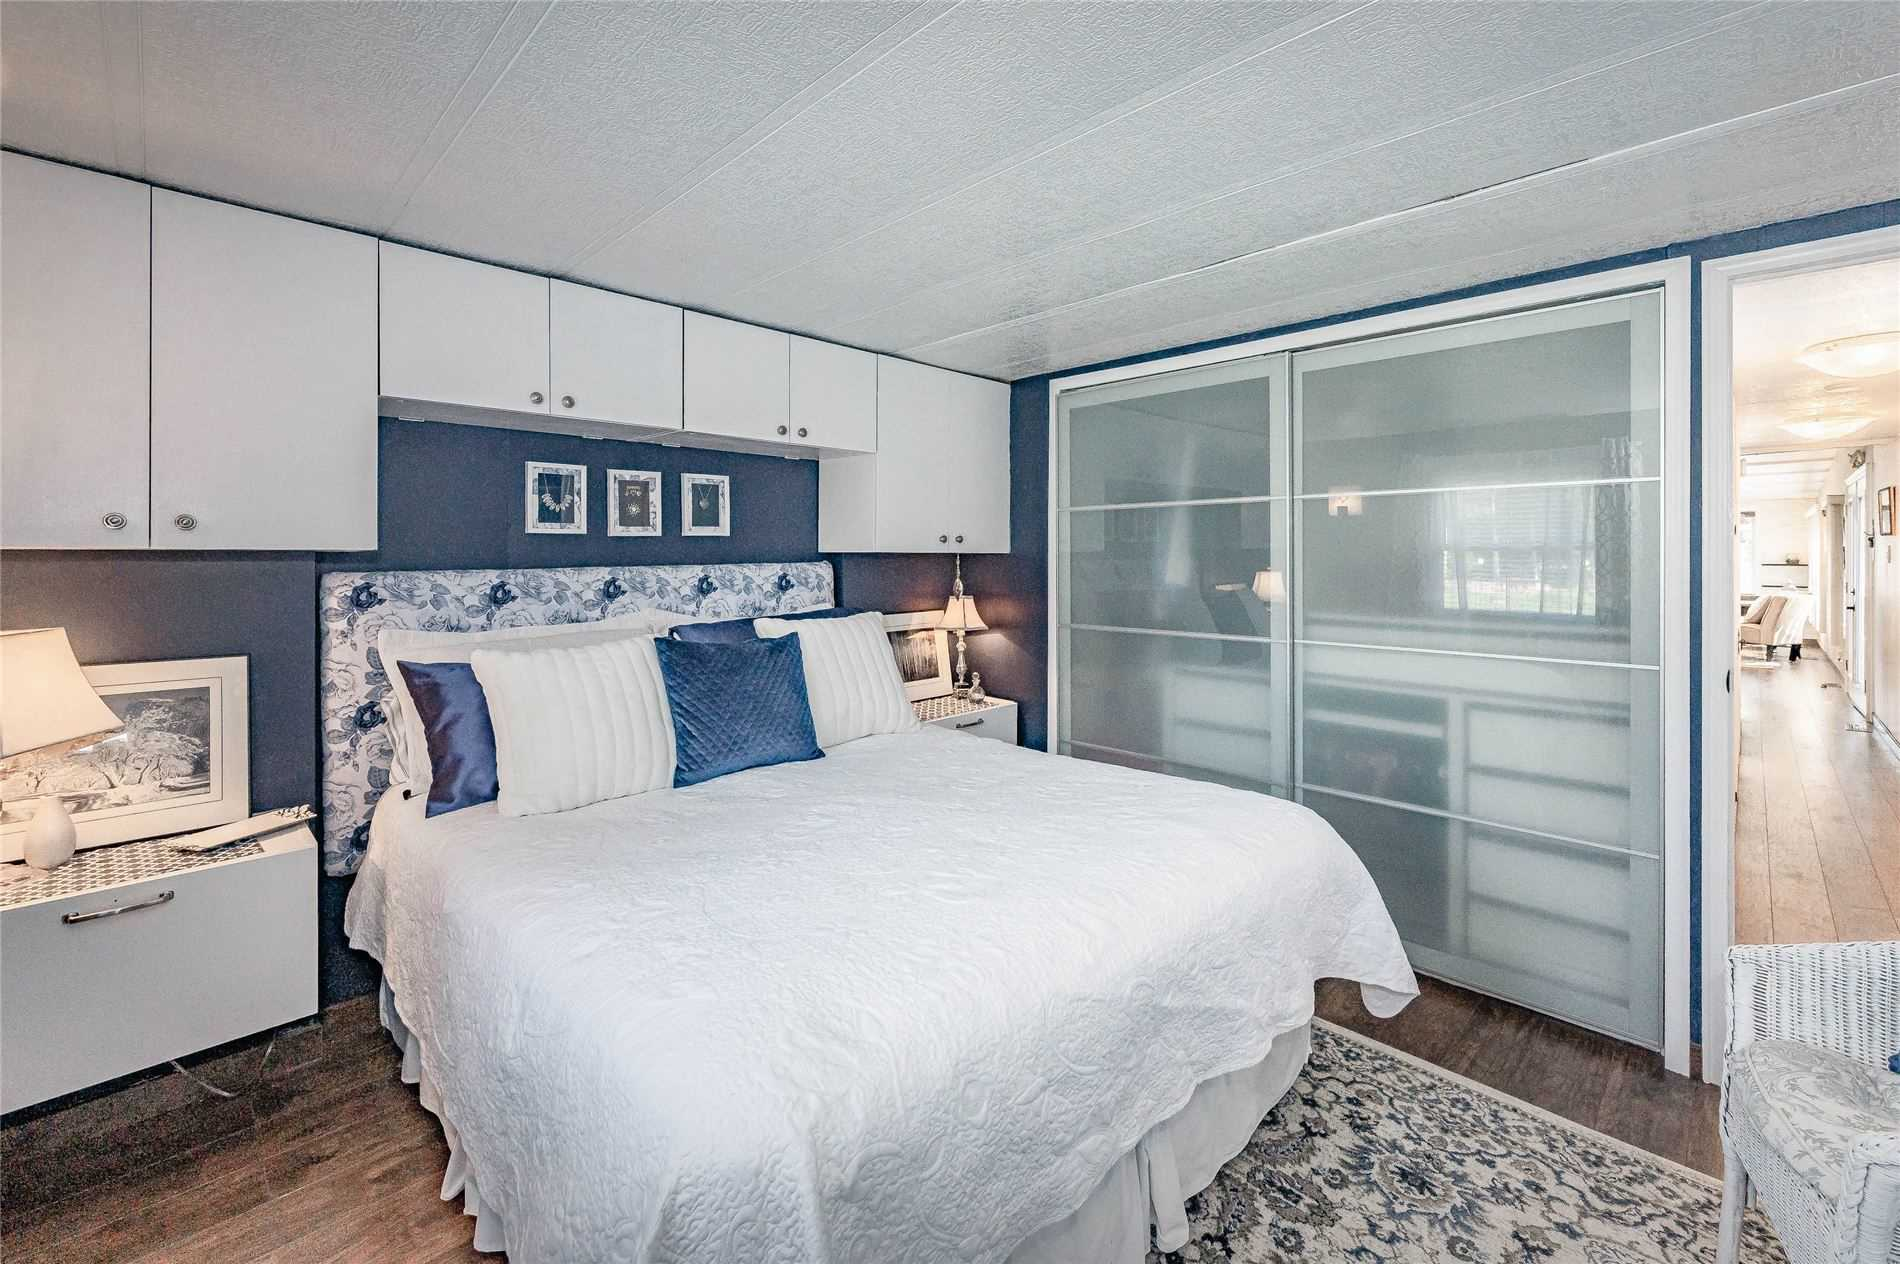 Mobile/trailer For Sale In Waterloo , 2 Bedrooms Bedrooms, ,1 BathroomBathrooms,Mobile/trailer,For Sale,Lot 158,Beaver Creek